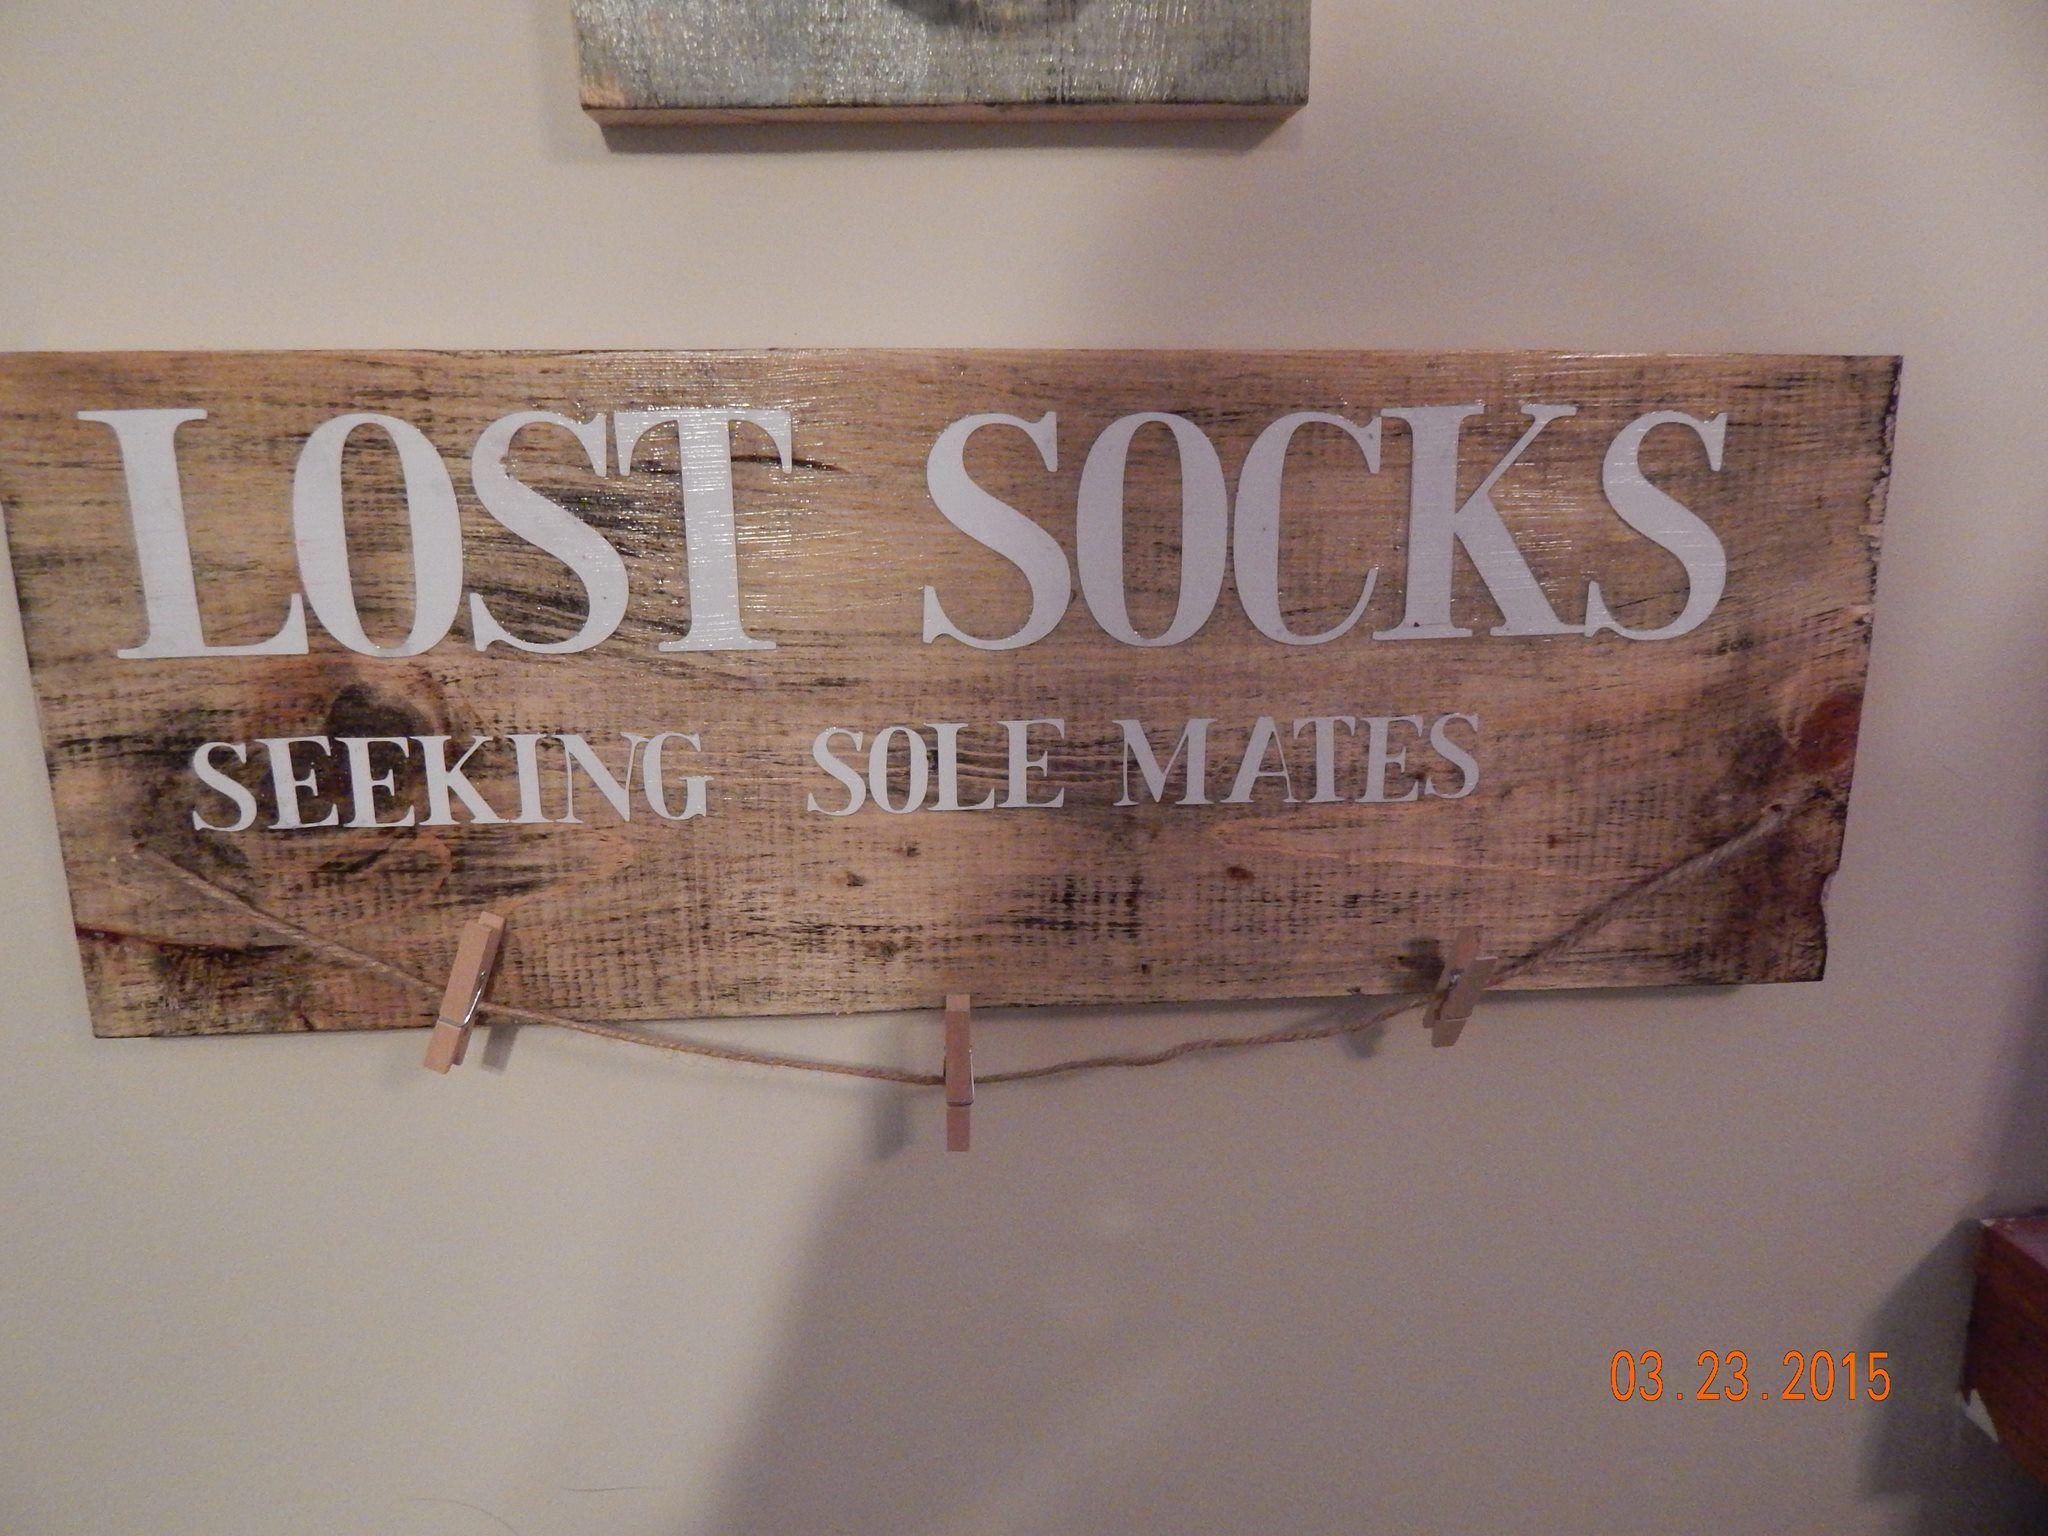 Rustic Laundry Room Signs Handmade Lost Socks Rustic Laundry Room Signviles Woodworking